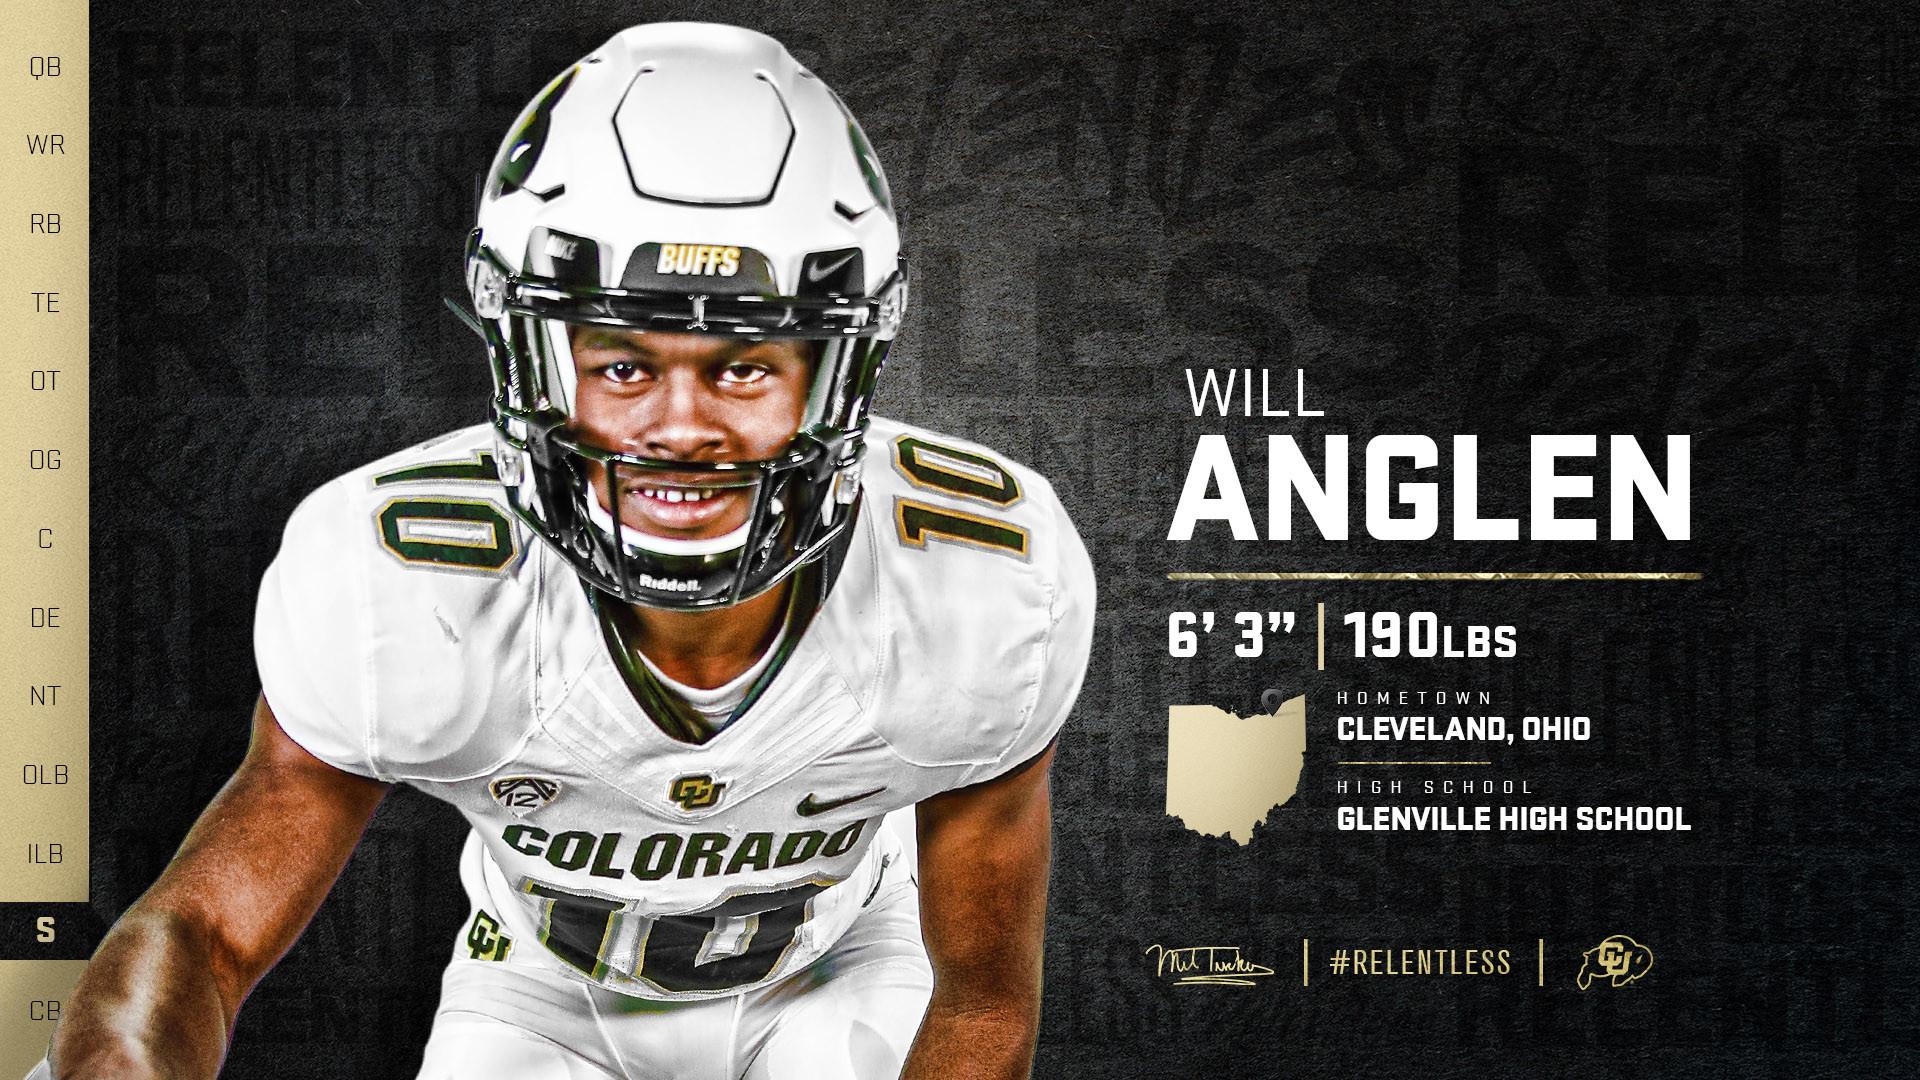 Will Anglen - 1920x1080 03.jpg